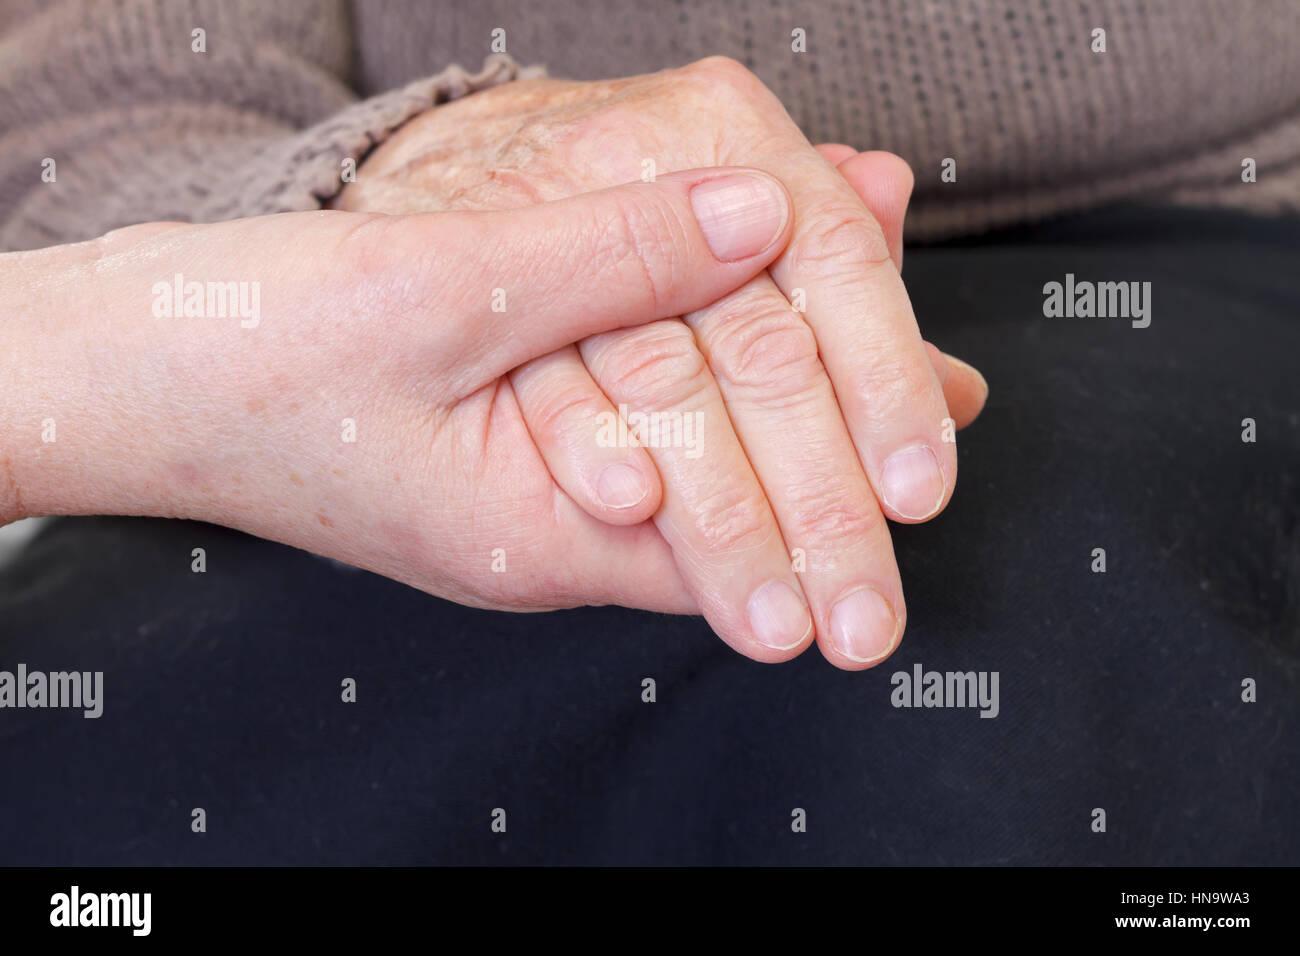 Doctor or nurse holding elderly wrinkled hand - Stock Image